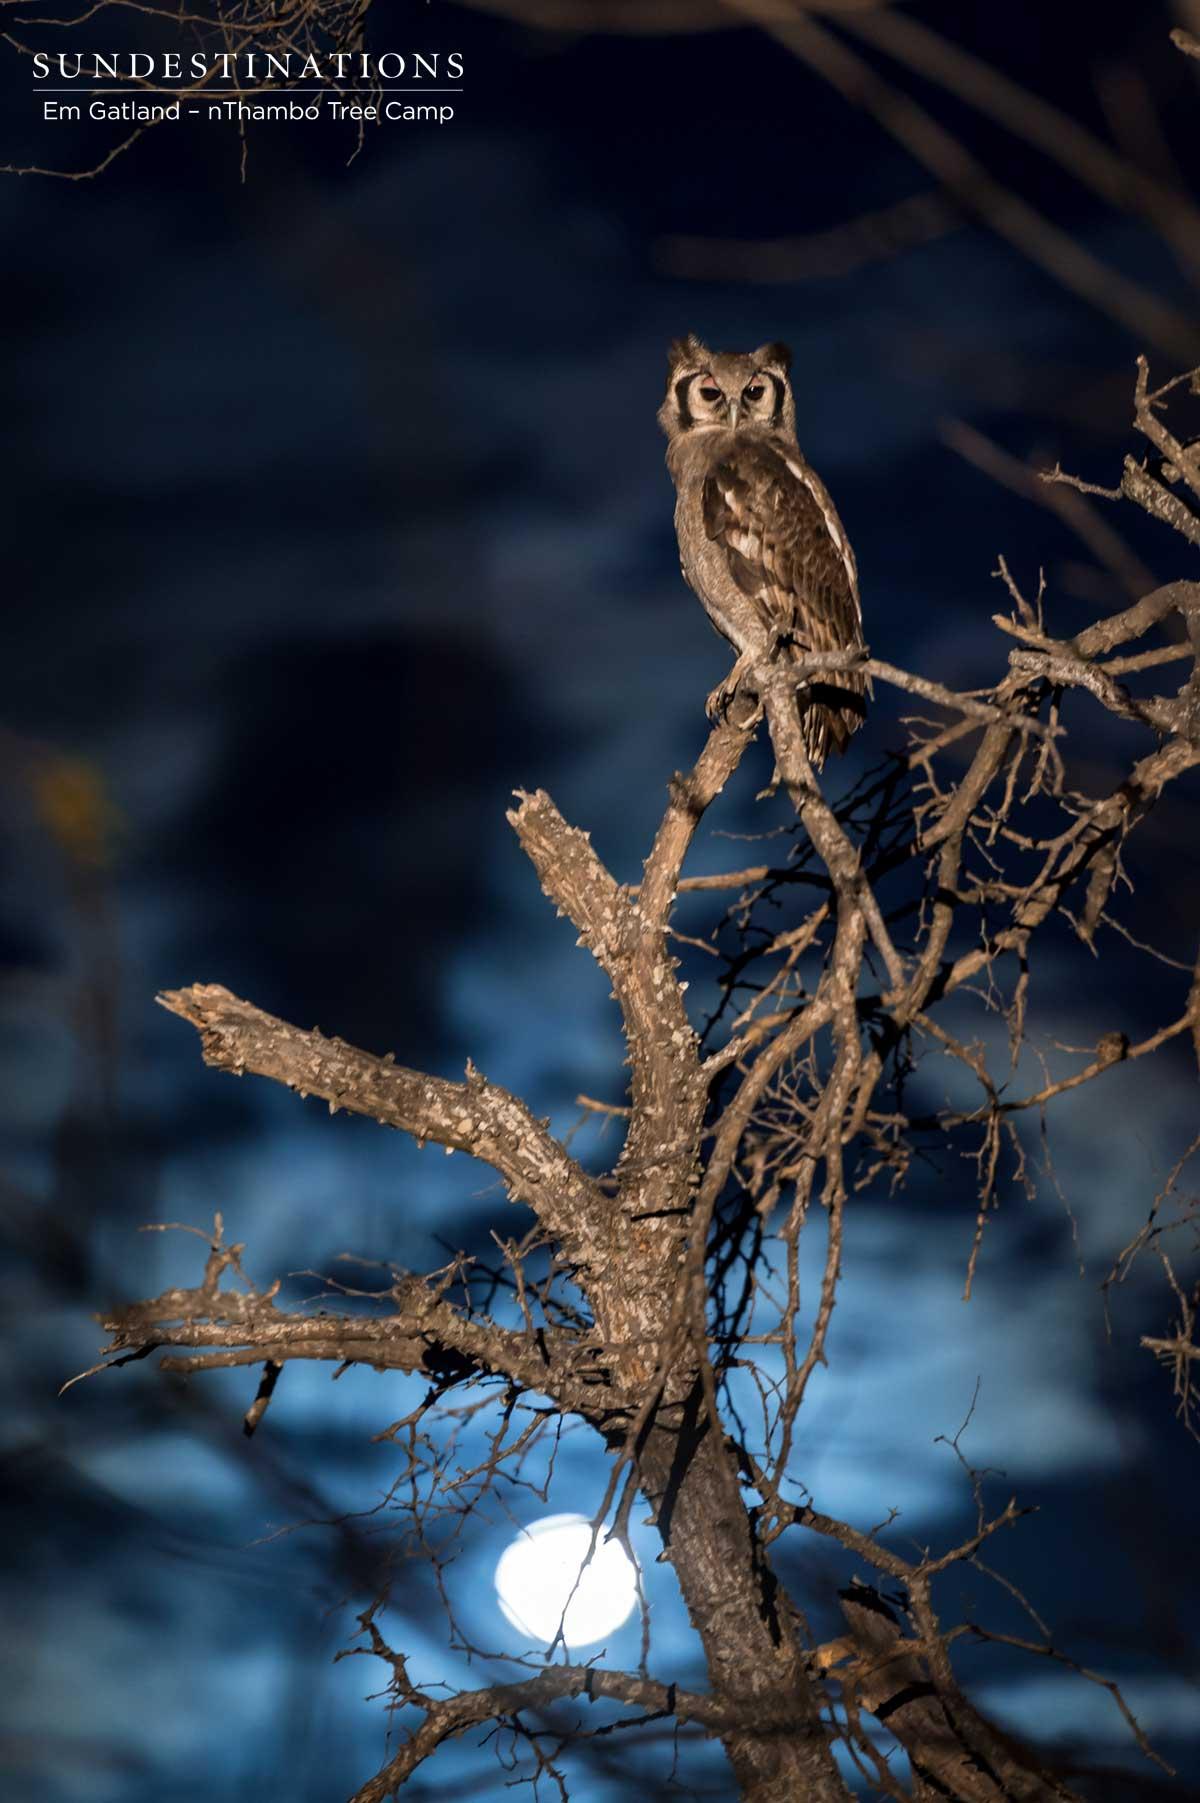 Giant Eagle Owl nThambo